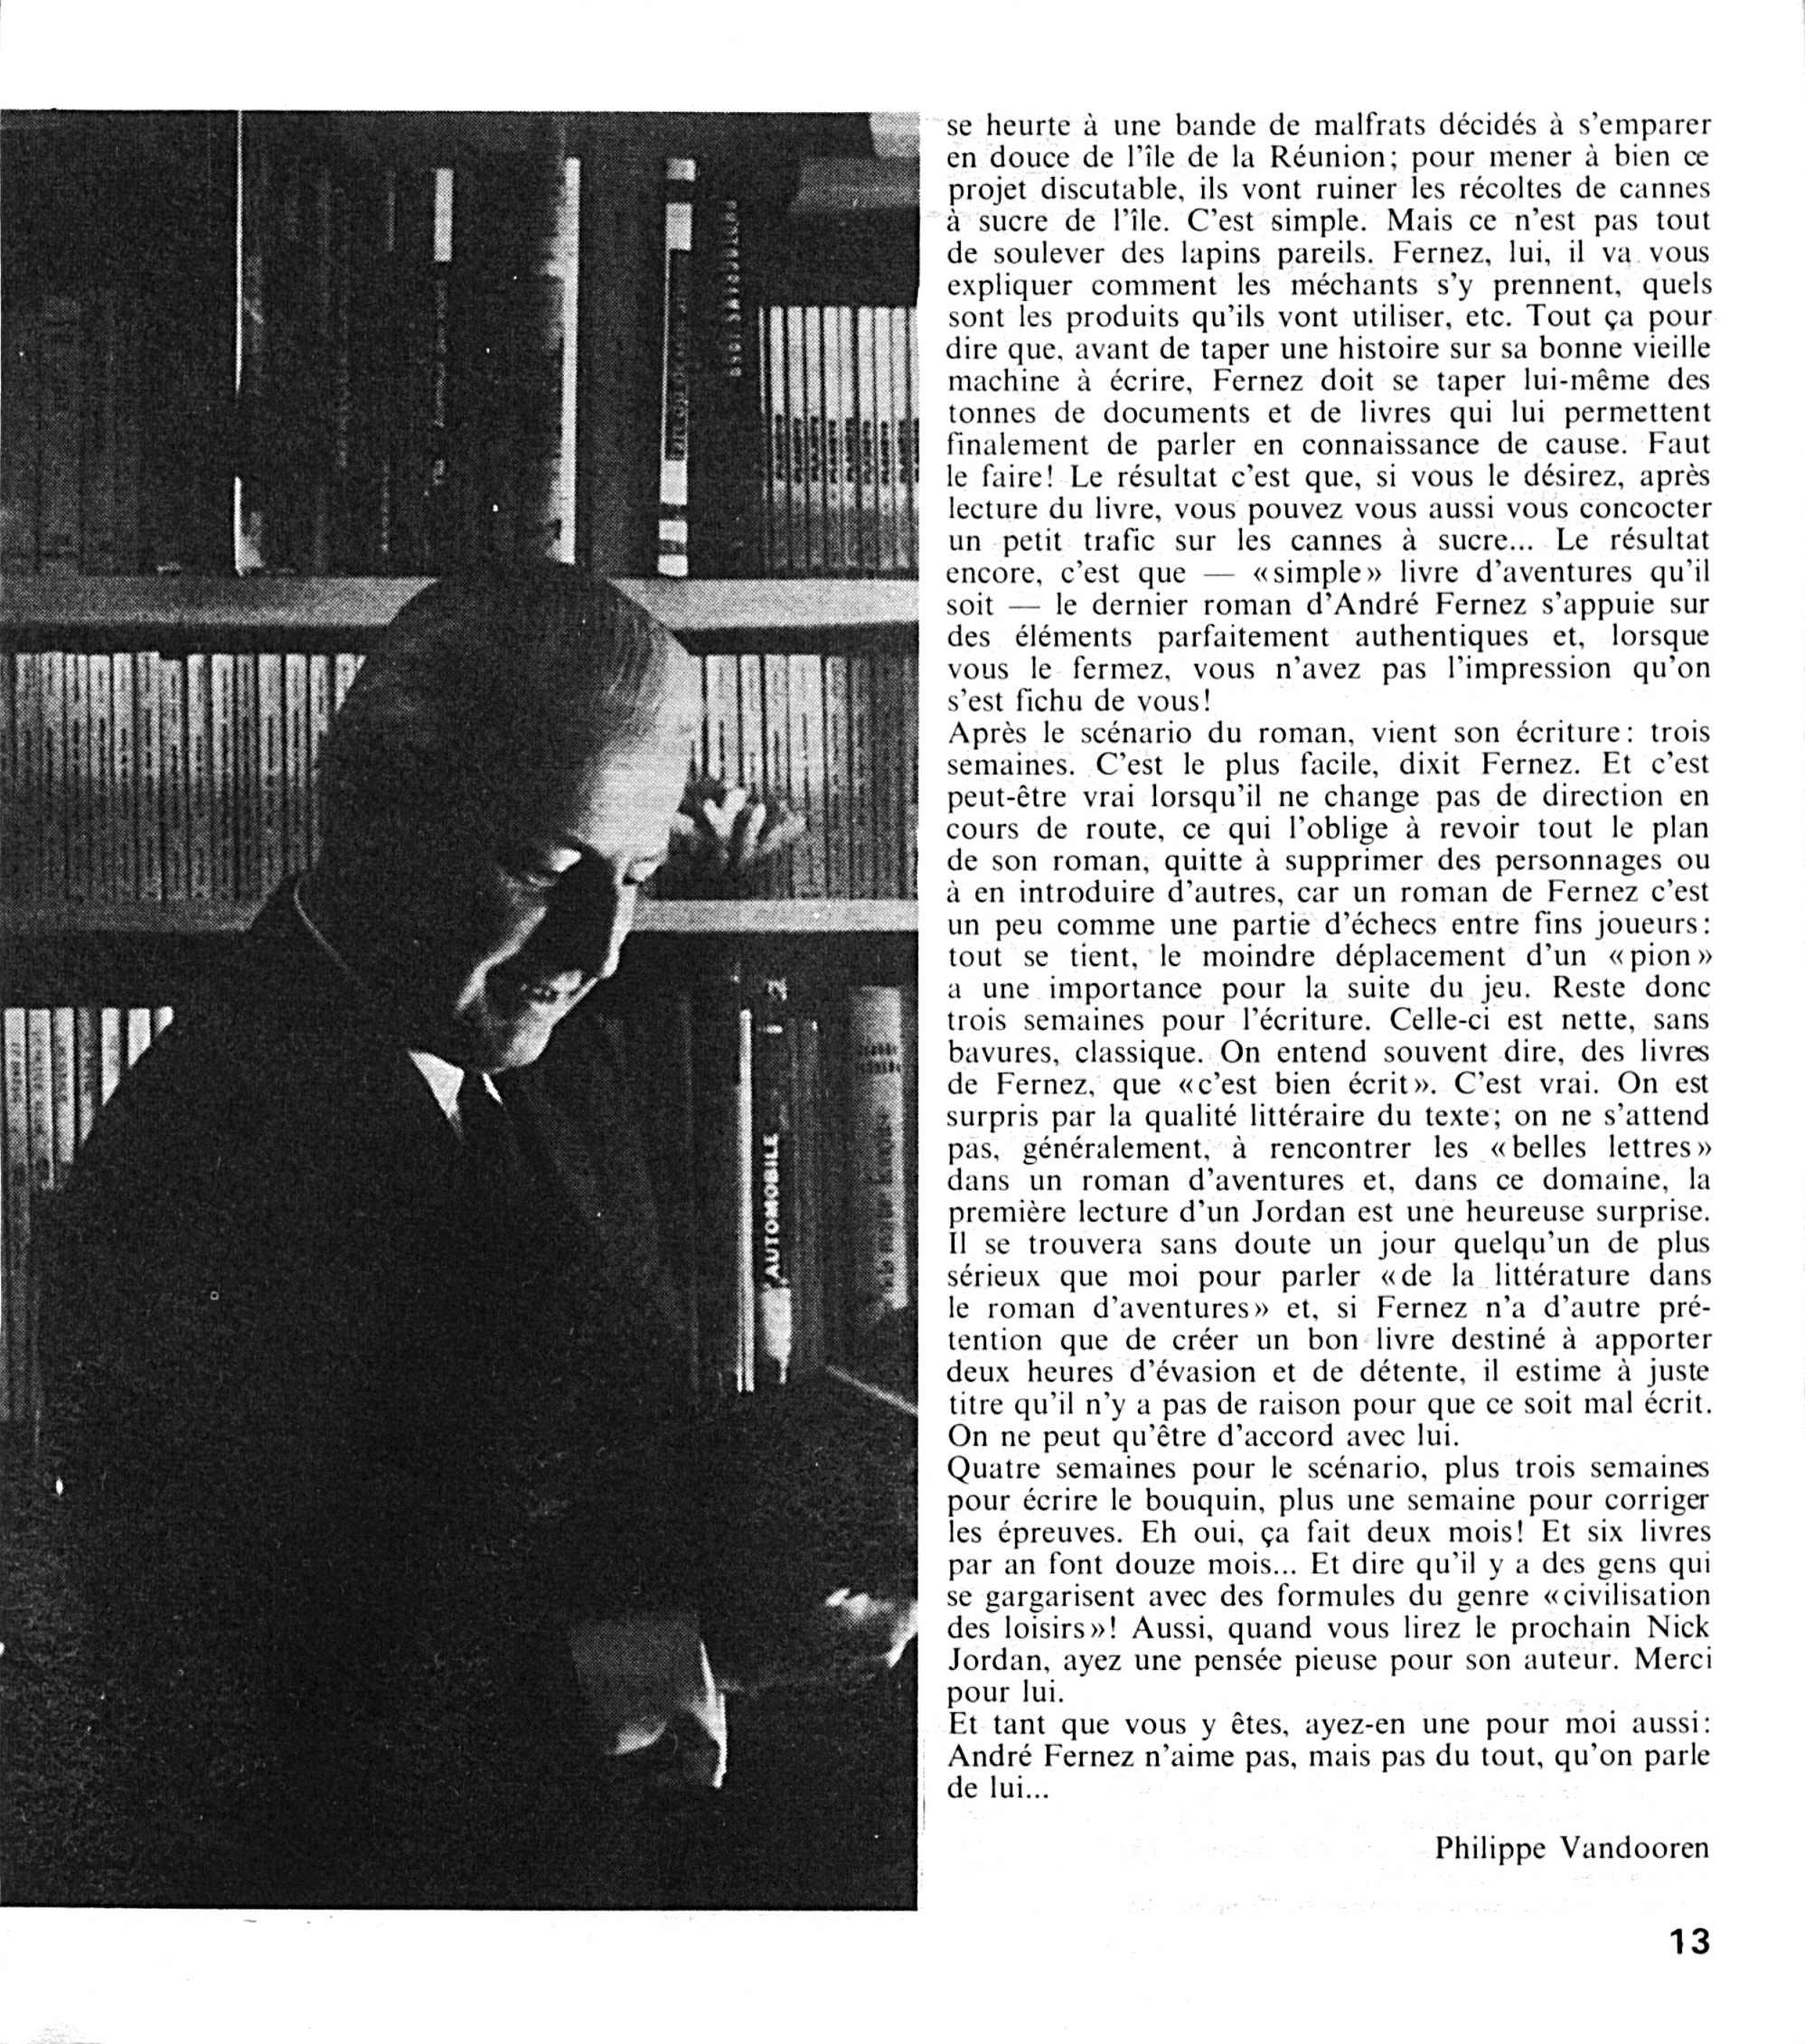 Extrait du magazine Marabout n°17 (1968). Merci à Masque Jade.